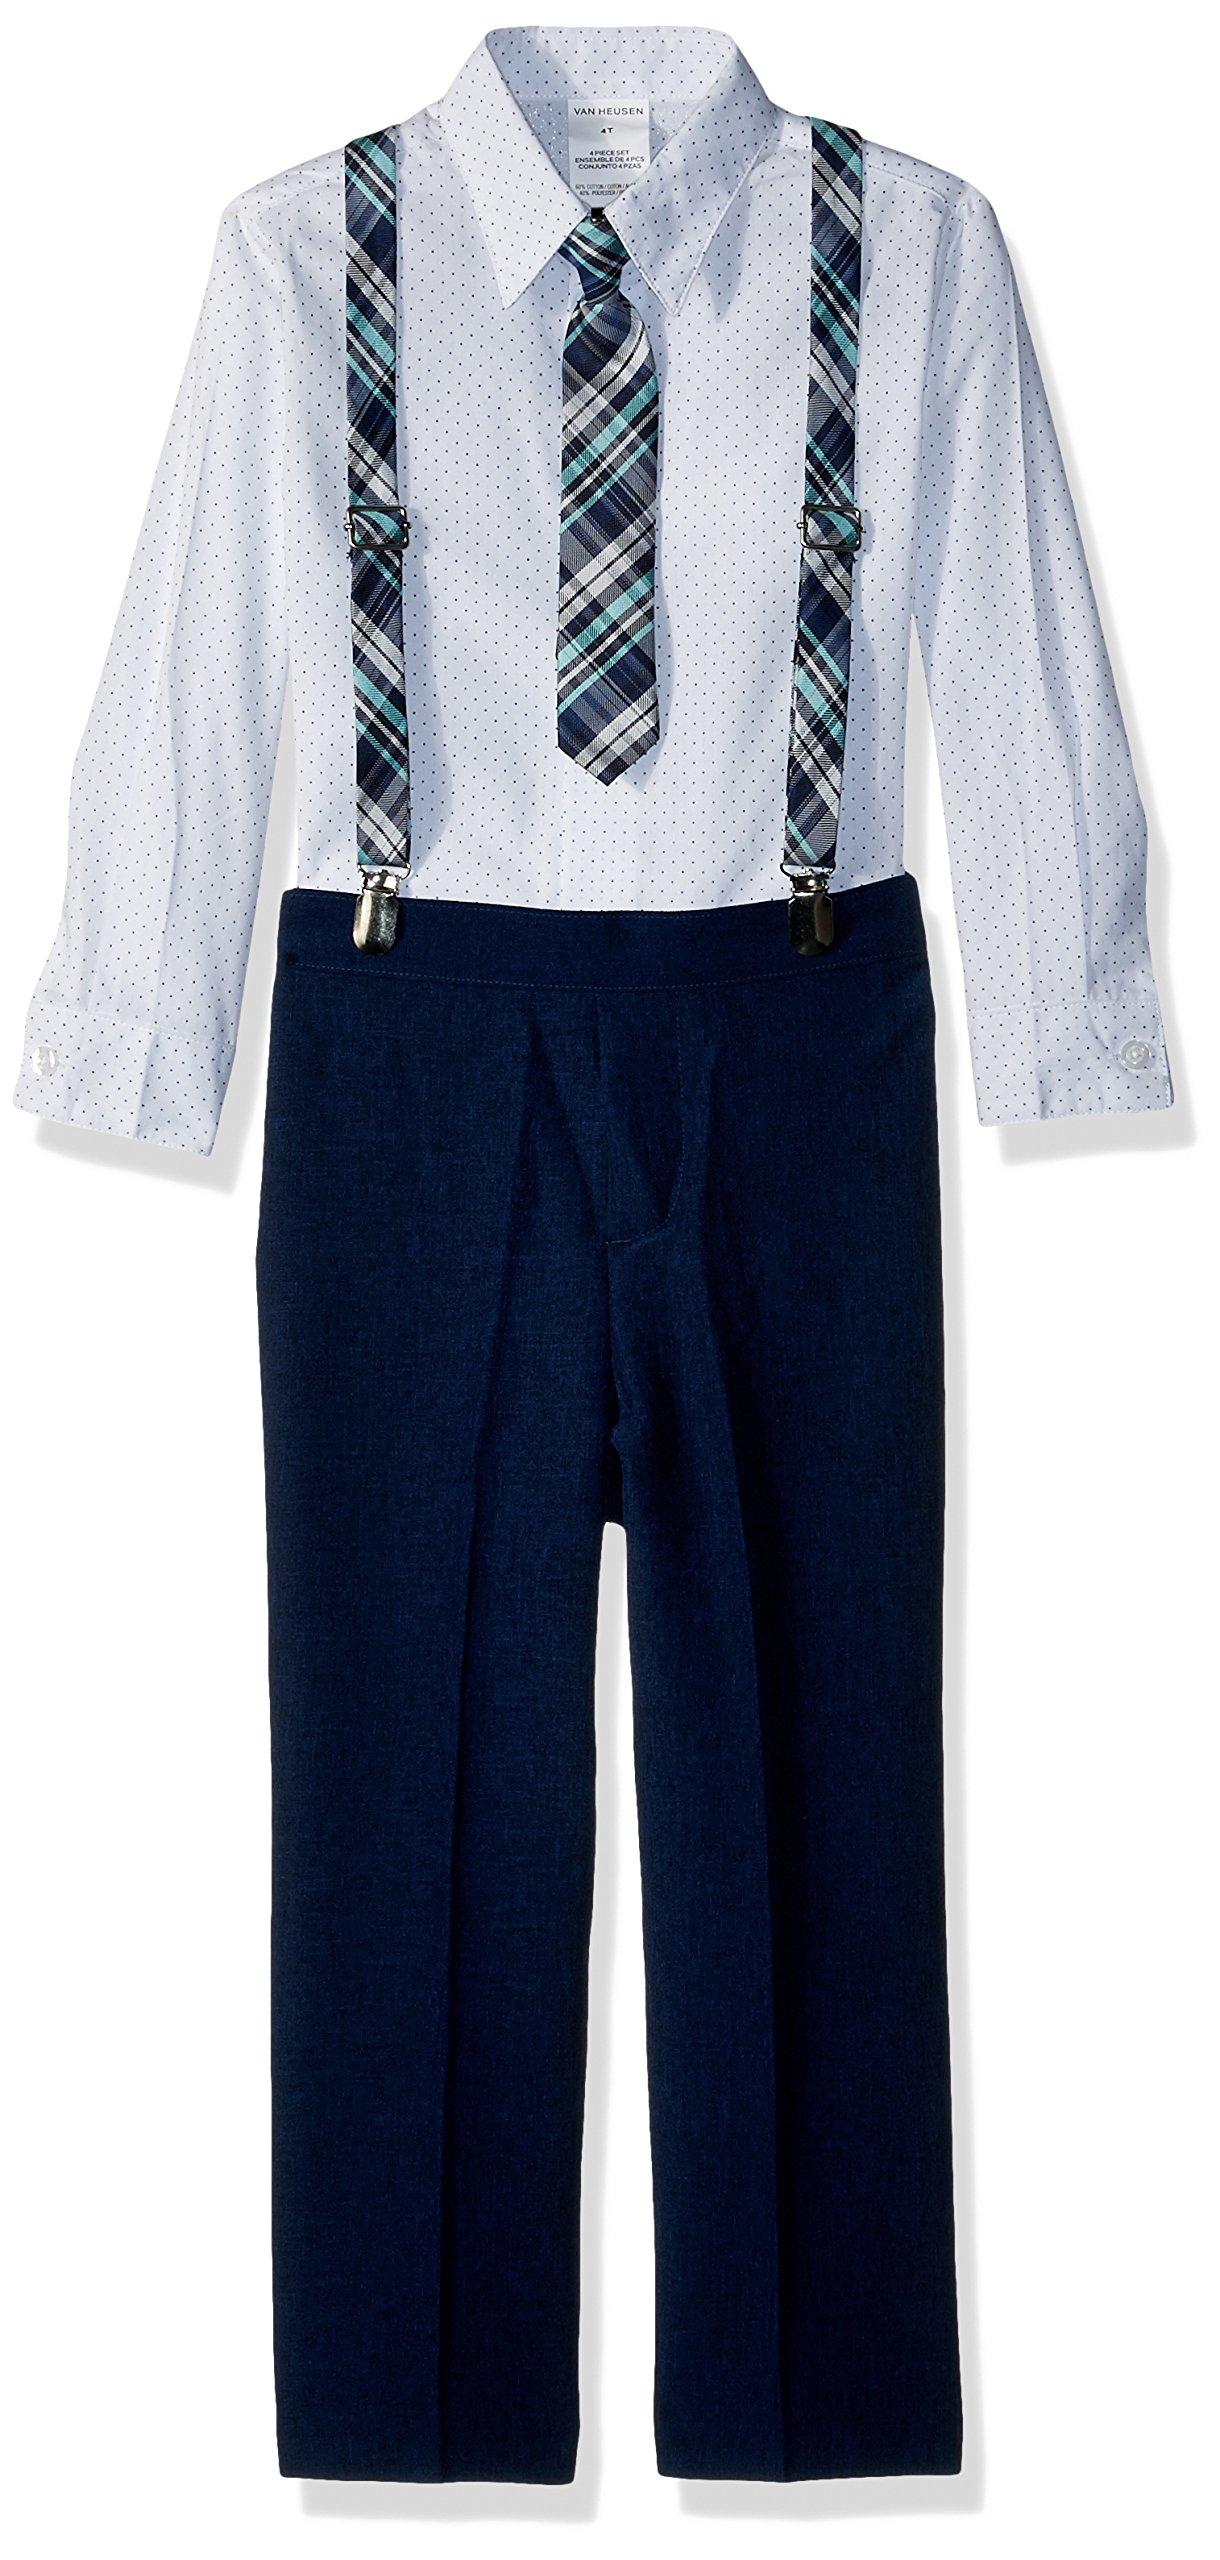 Van Heusen Toddler Boys' Four Piece Suspender Set, Poplin Academy Blue, 4T